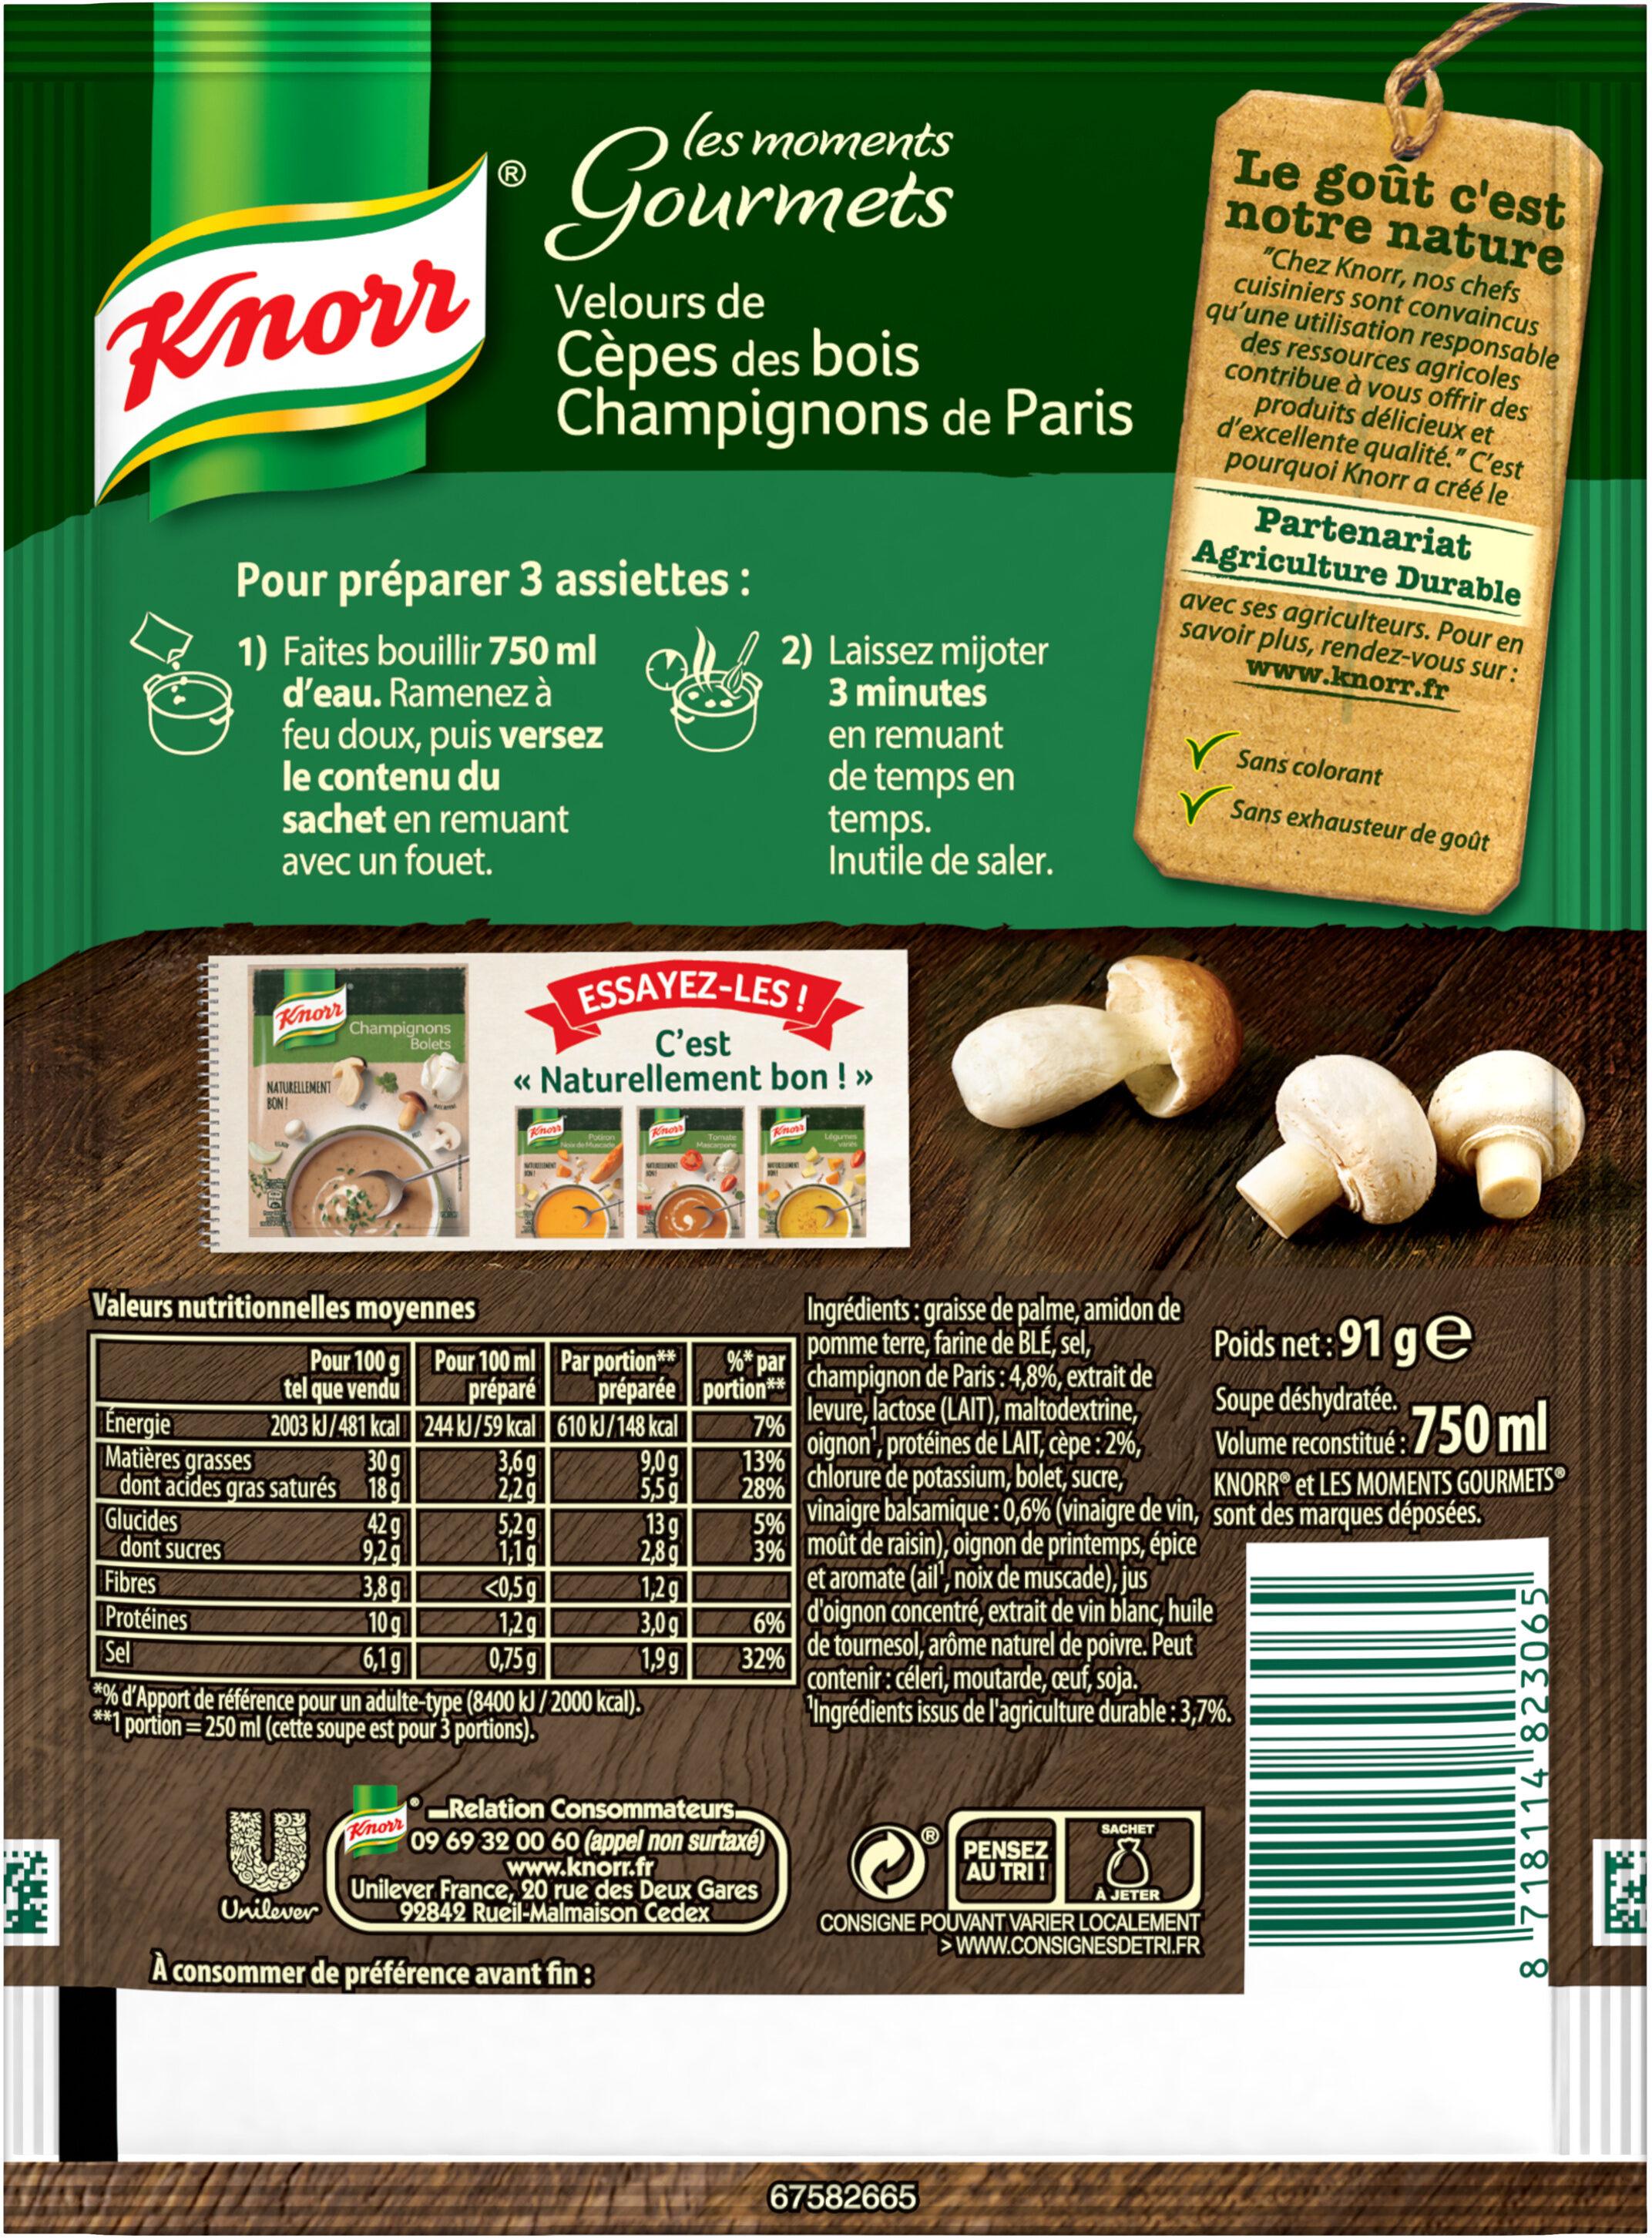 Knorr Moments Gourmets Soupe Velours de Cèpes Champignons 91g 3 Portions - Voedingswaarden - fr